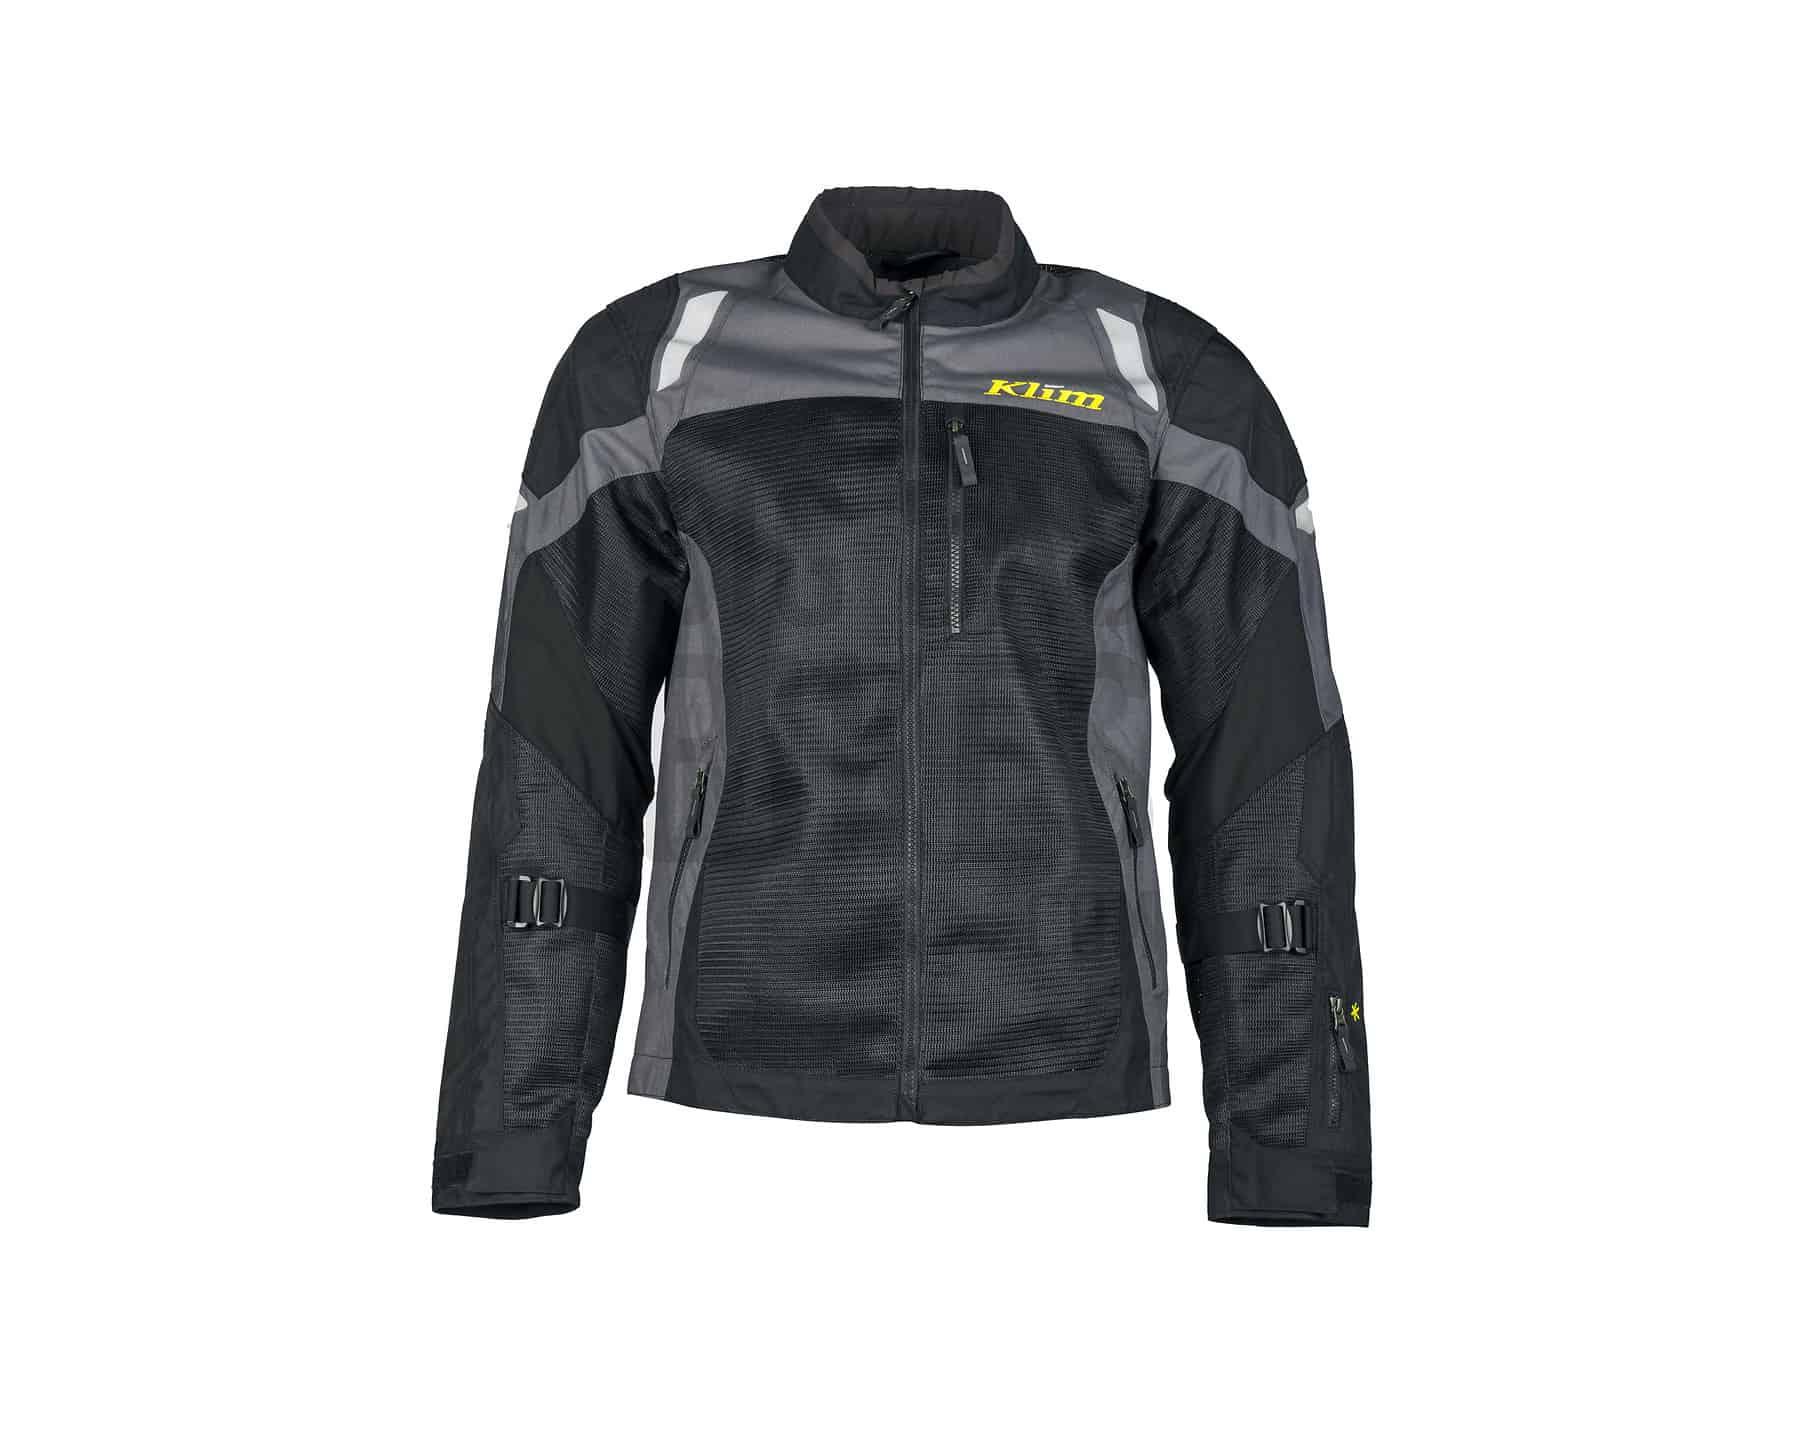 Induction Jacket_5060-002_Dark Gray_01